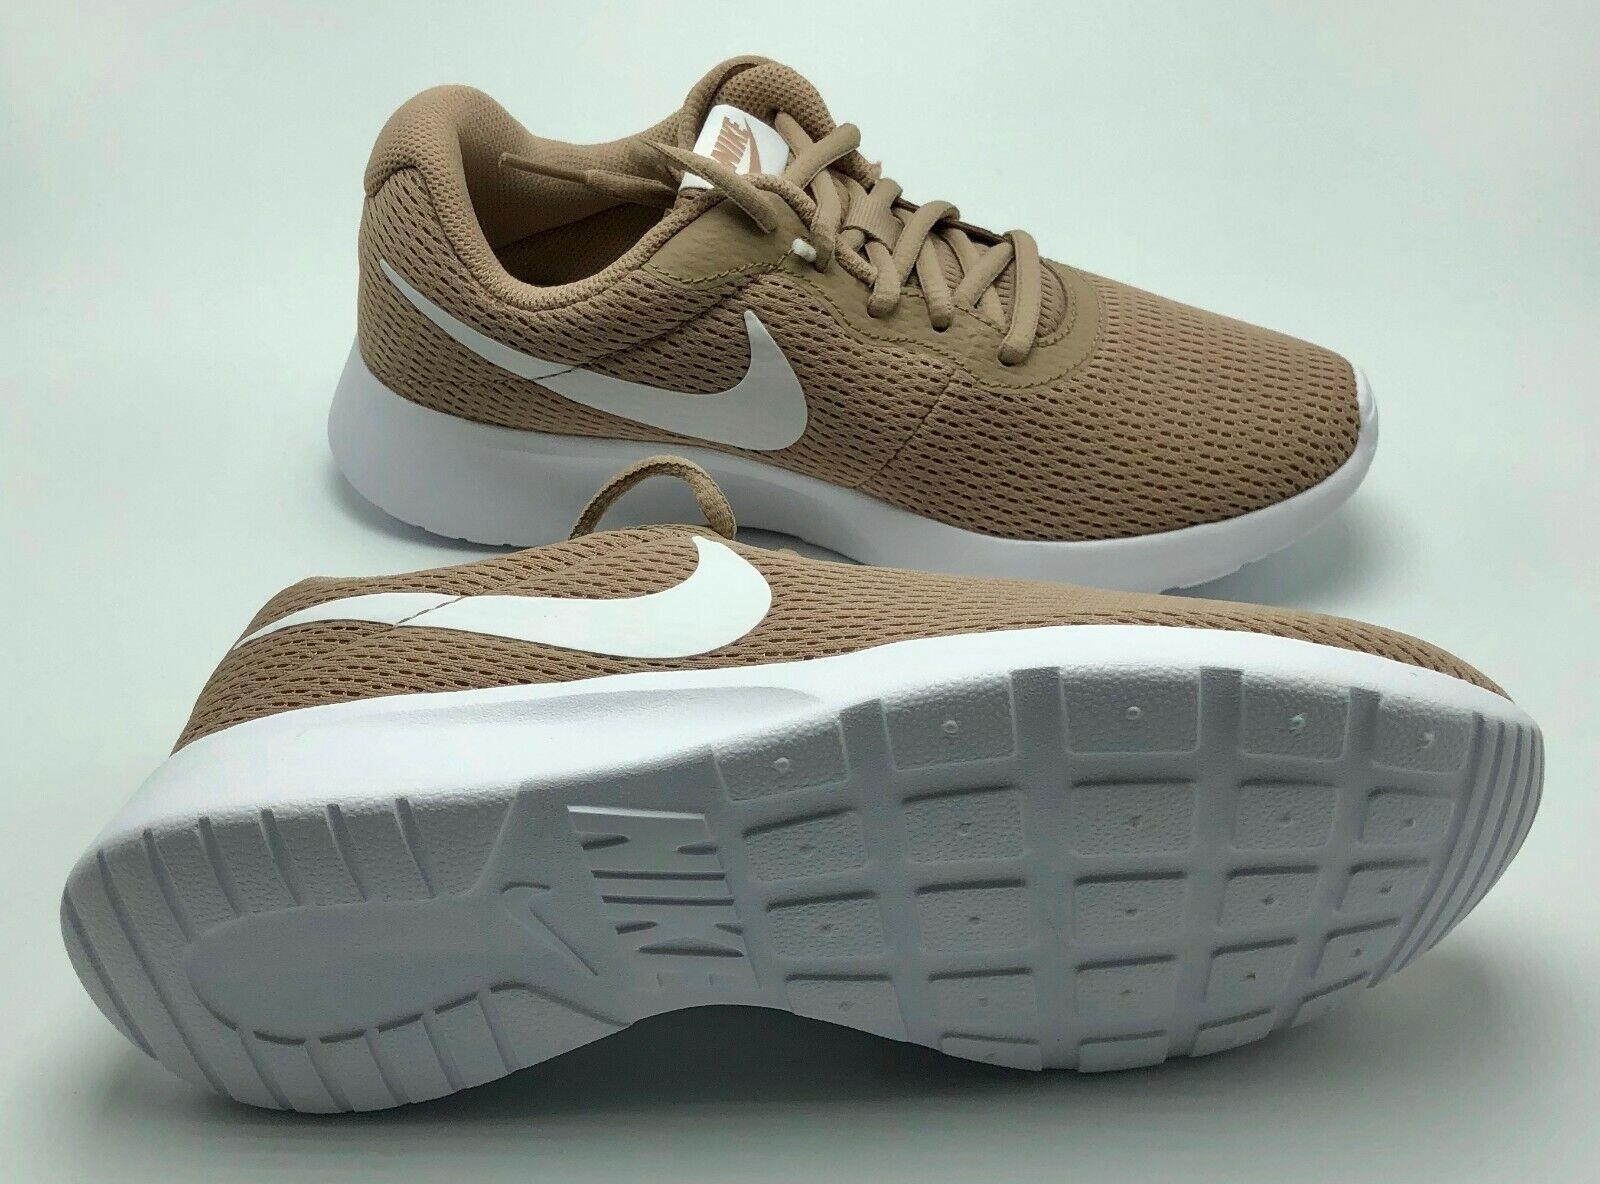 Nike Women's Tanjun Tanjun Tanjun Running shoes Sand White US 7 6909e3